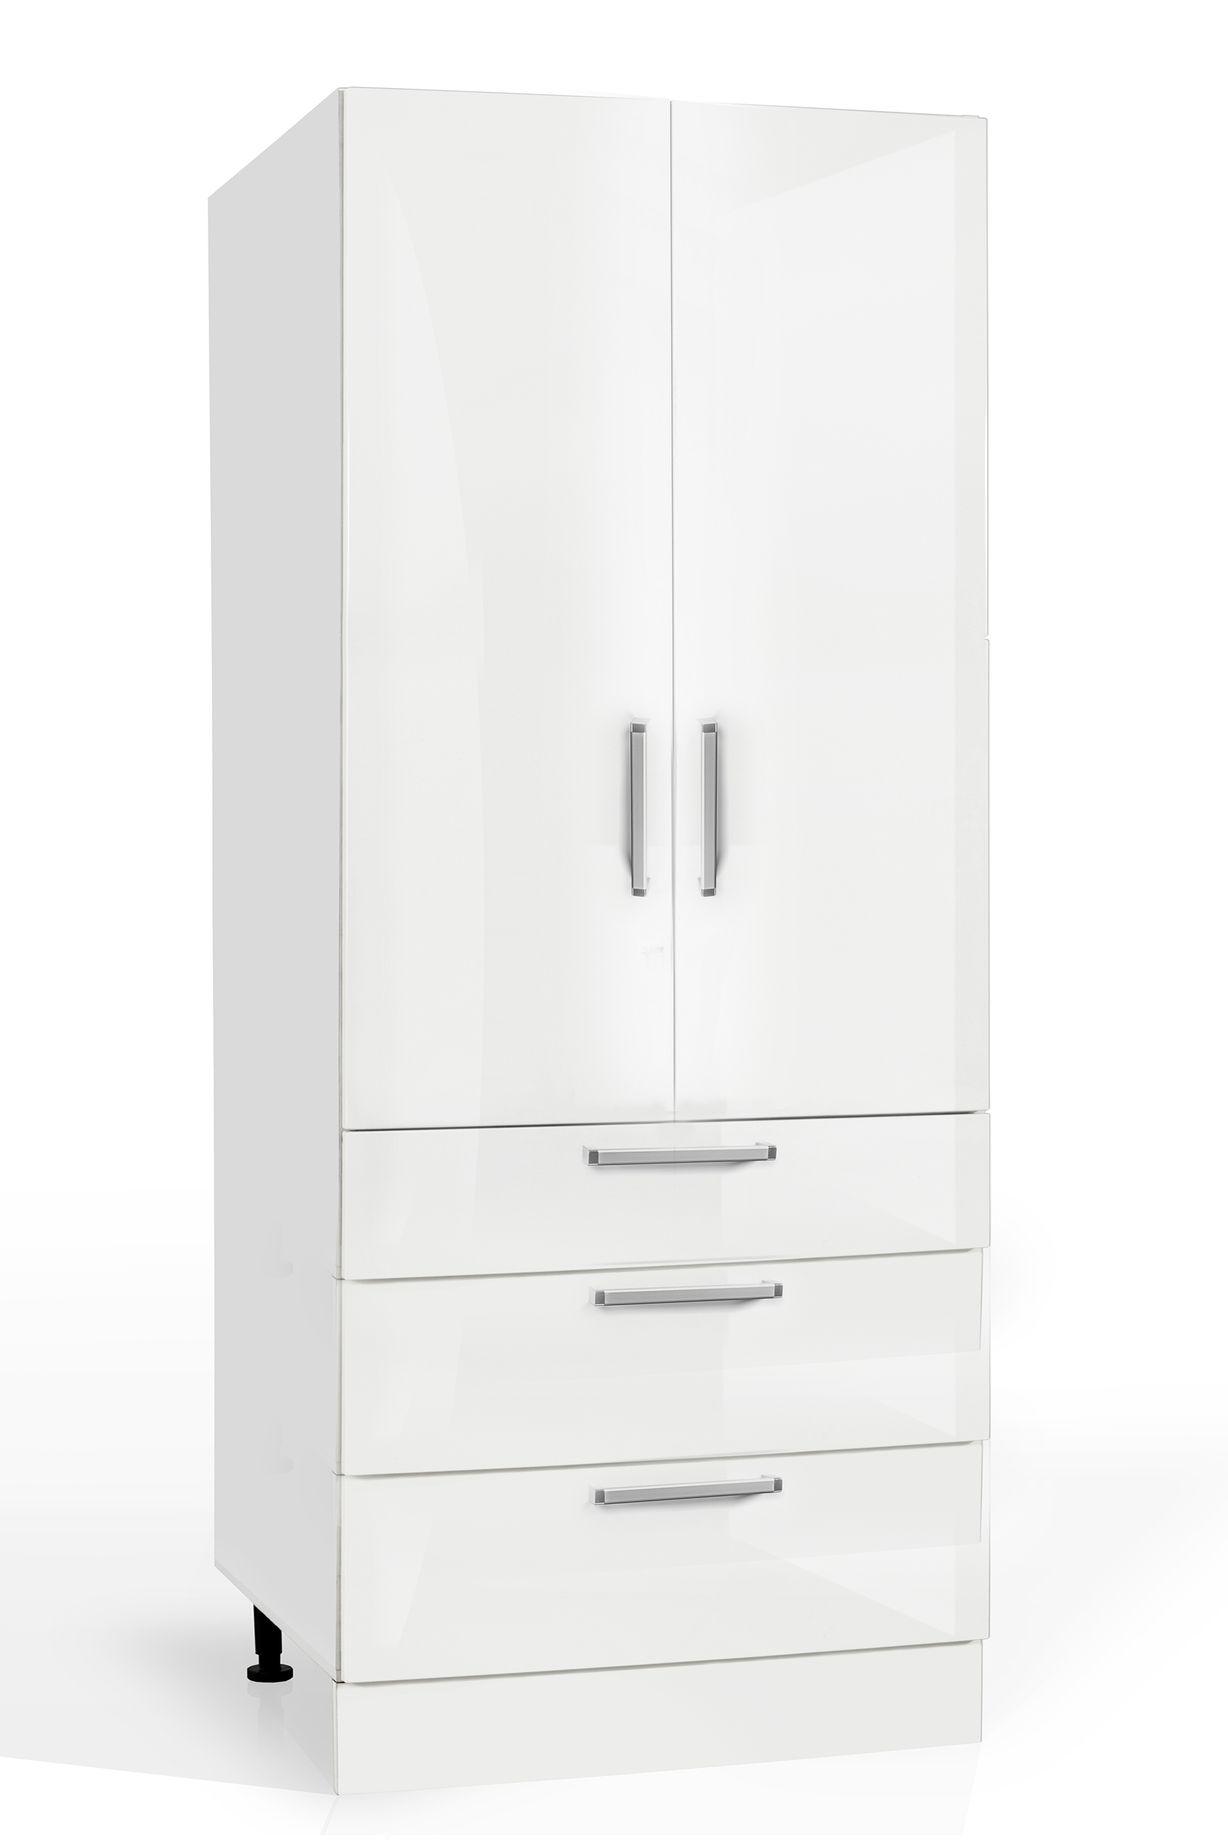 Bunnings Kitchen Cabinet Doors Pantry Cabinet Door Pantry Cabinet With Bedford Mm White Door